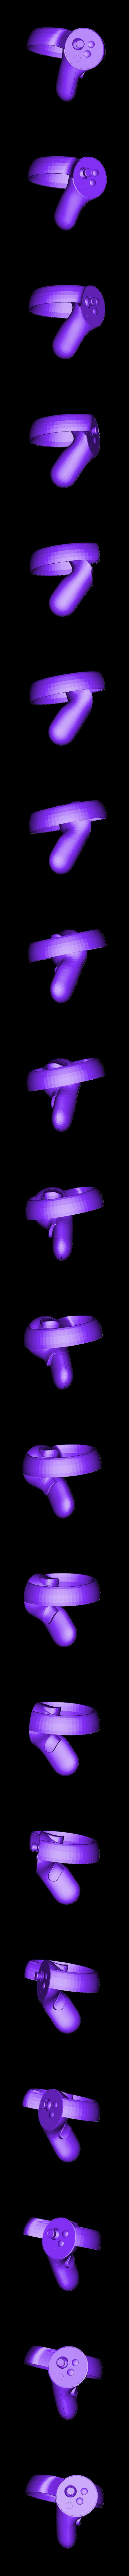 CV1_Whole.stl Download free STL file Oculus Rift Controller • Model to 3D print, indigo4